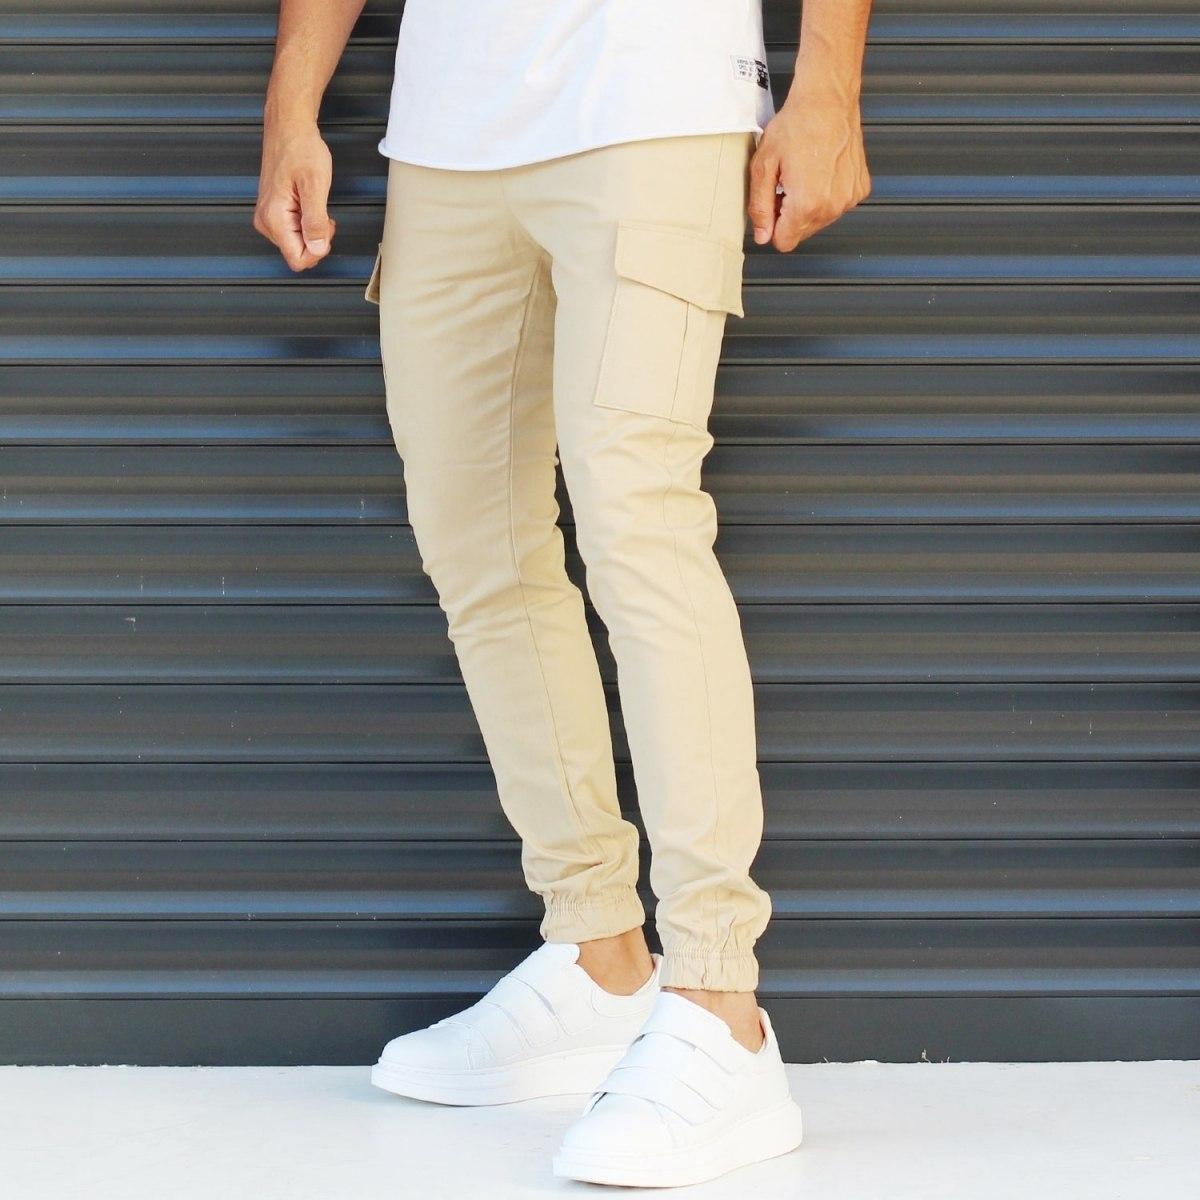 Men's Sport Pants With Side Pockets Beige Mv Premium Brand - 2